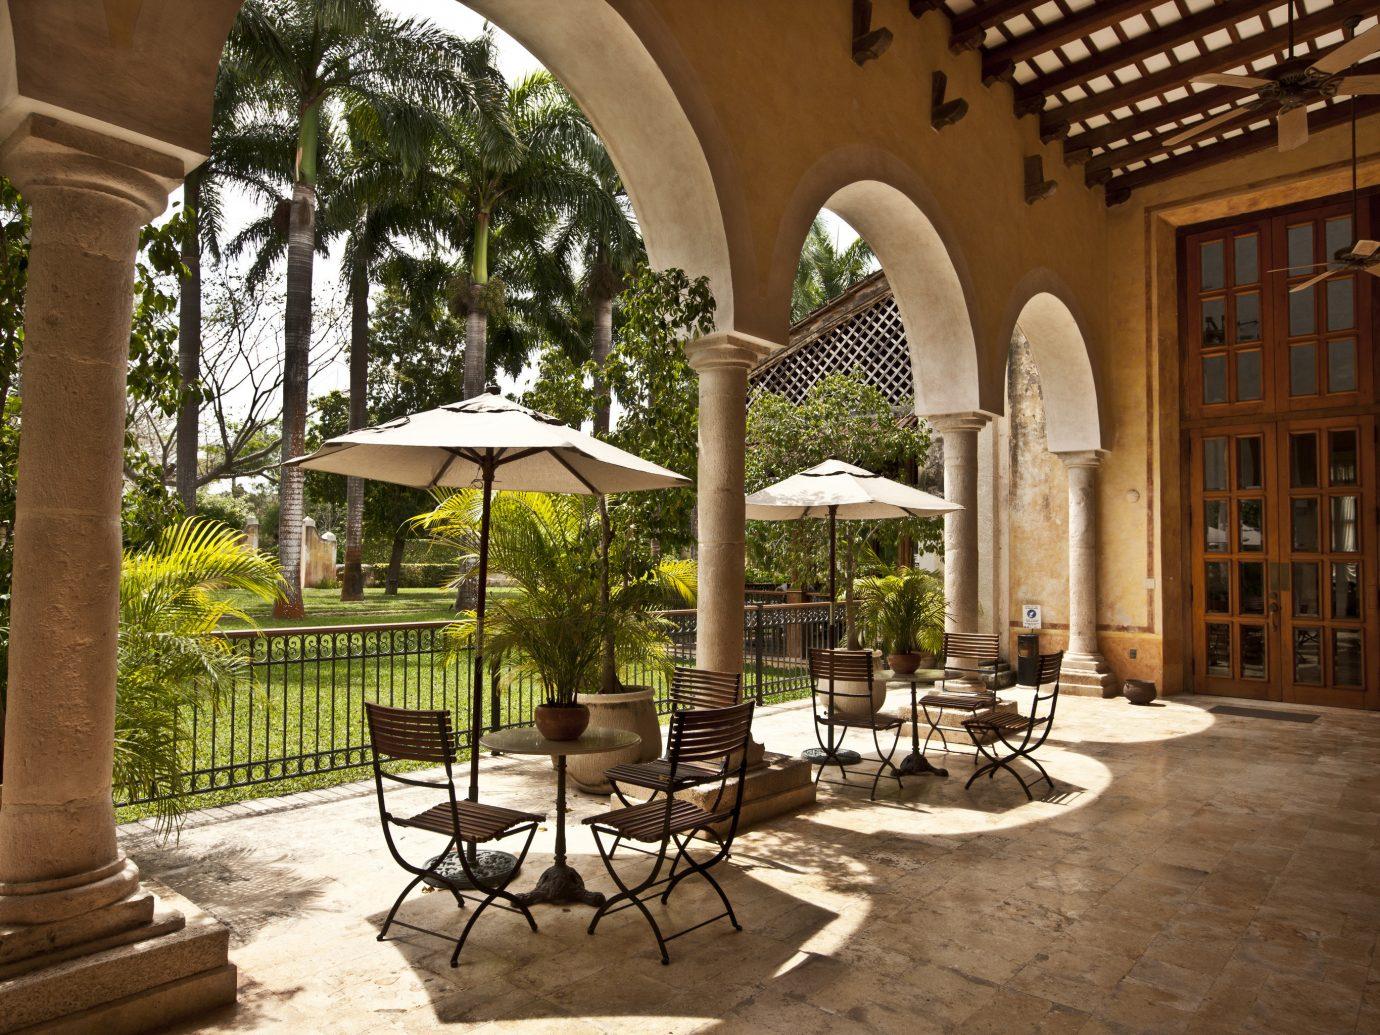 Beach Honeymoon Hotels Mexico Romance Tulum property estate Courtyard hacienda arecales real estate Patio palm tree outdoor structure tree Resort plant Villa window interior design